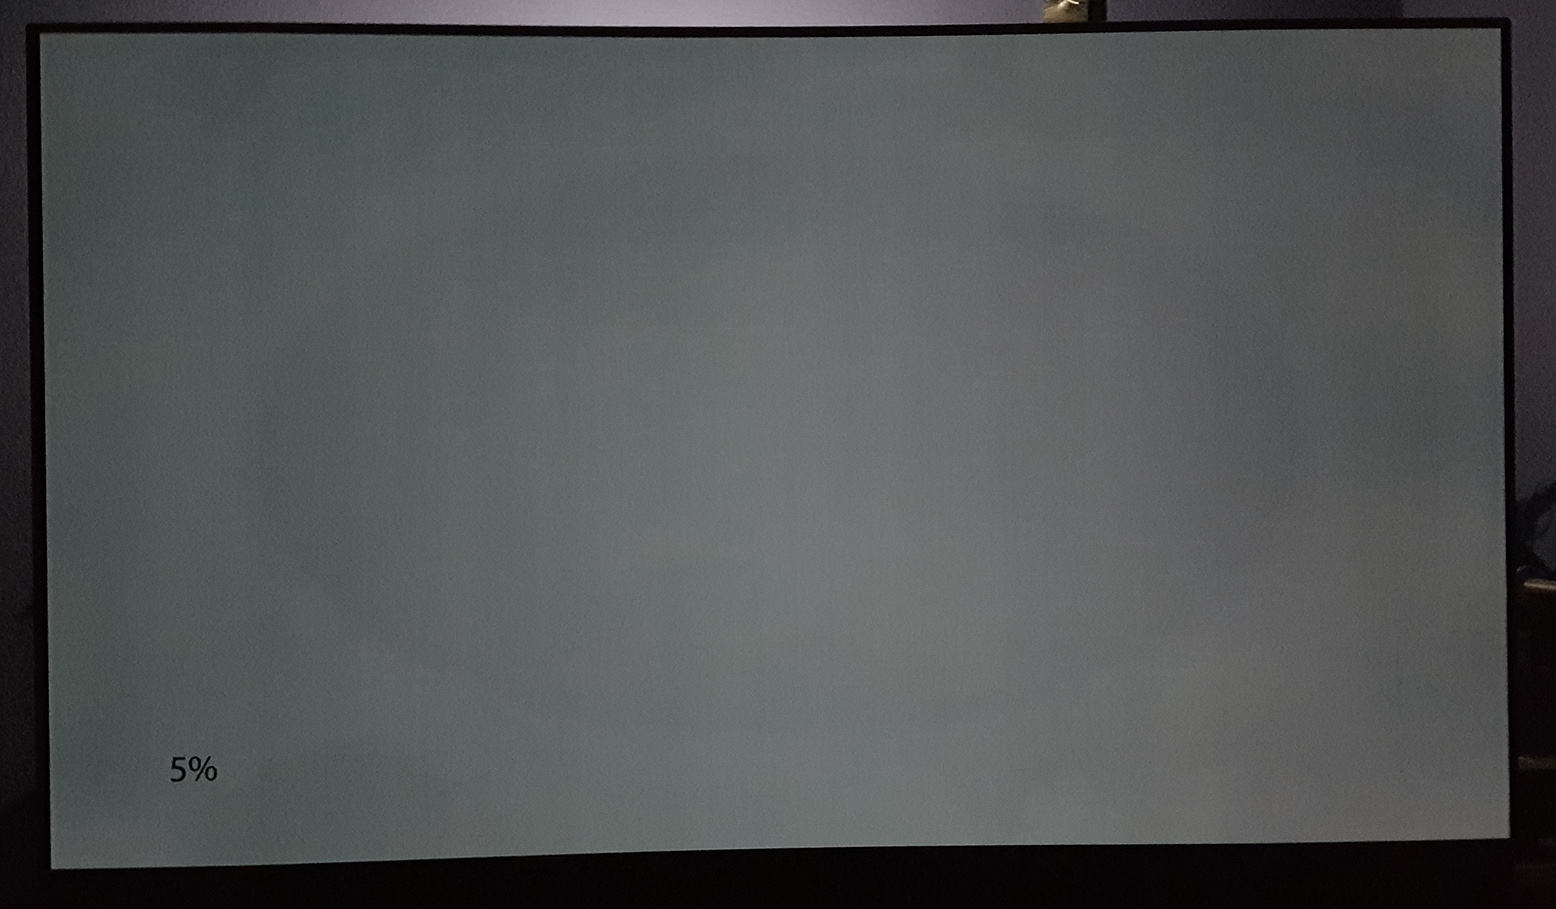 LG 55C8 problem in Game Mode | [H]ard|Forum